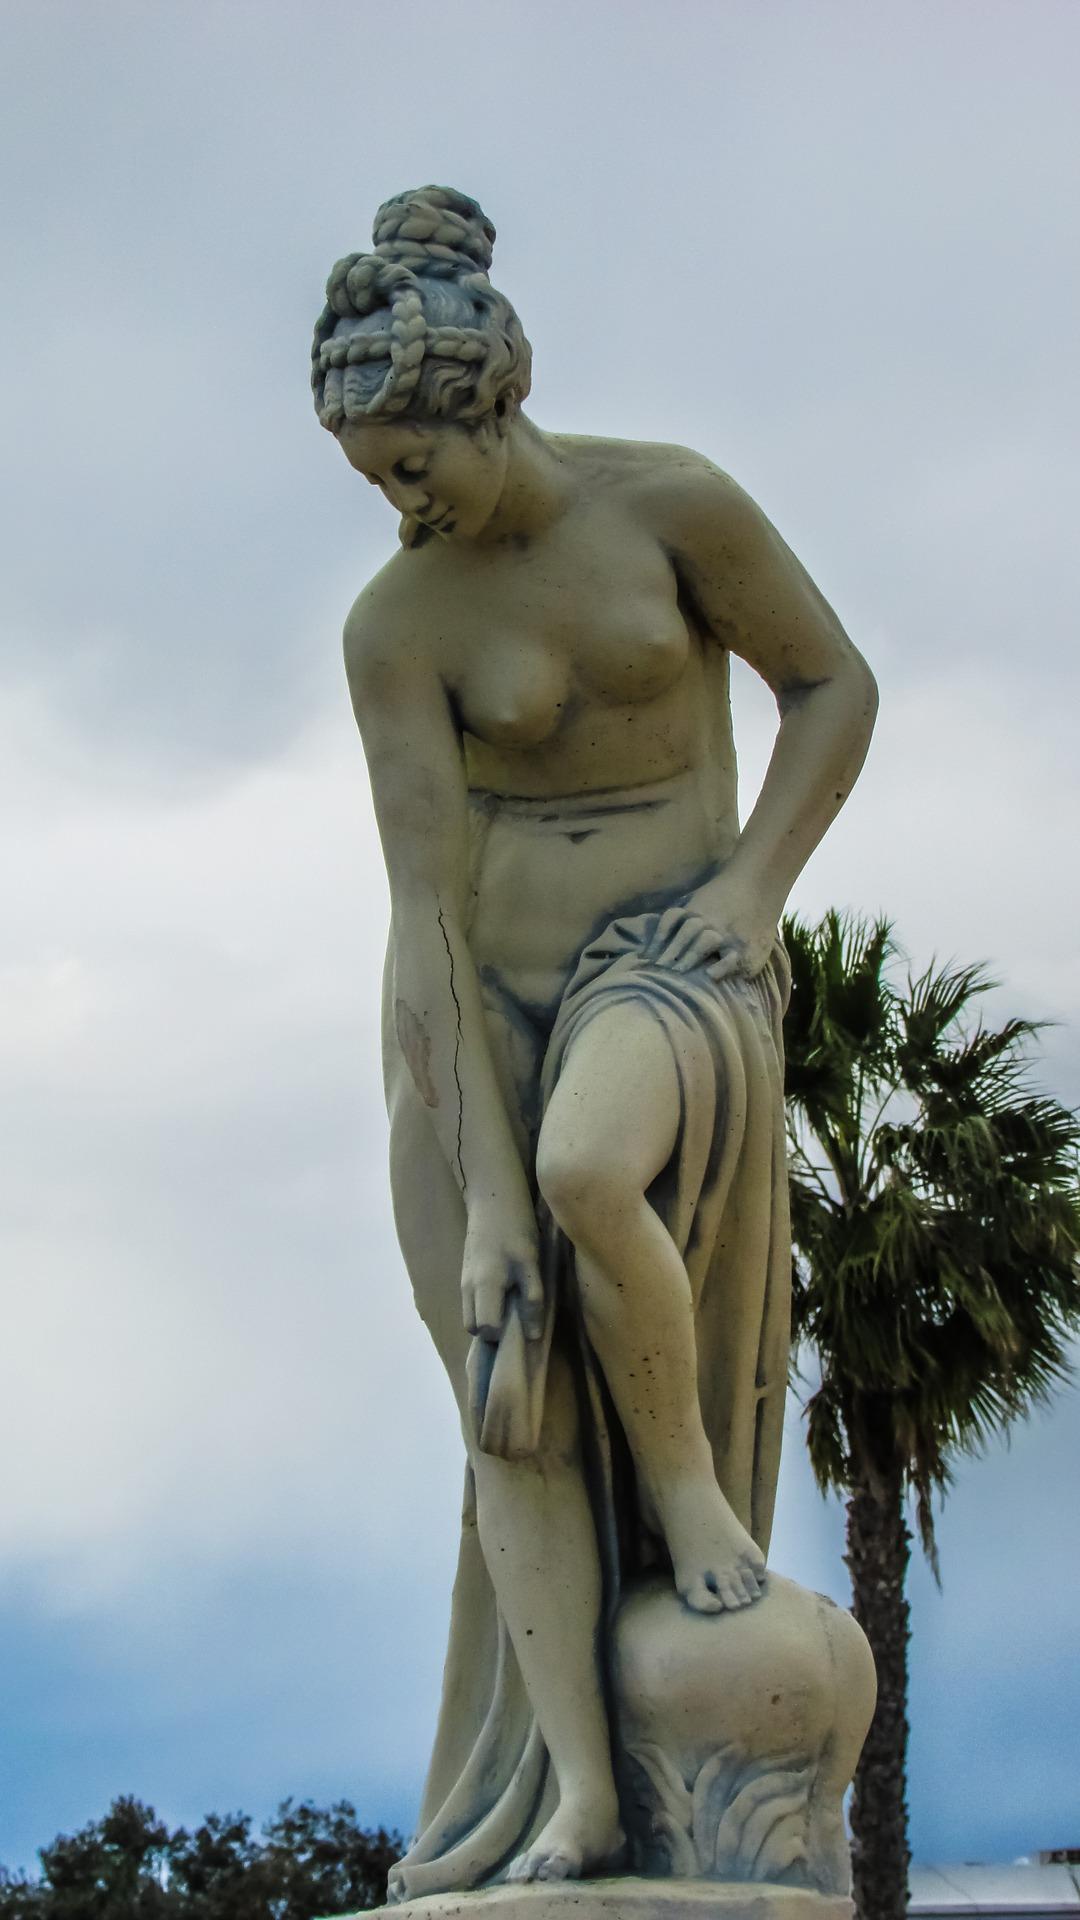 cyprus-1183804_1920